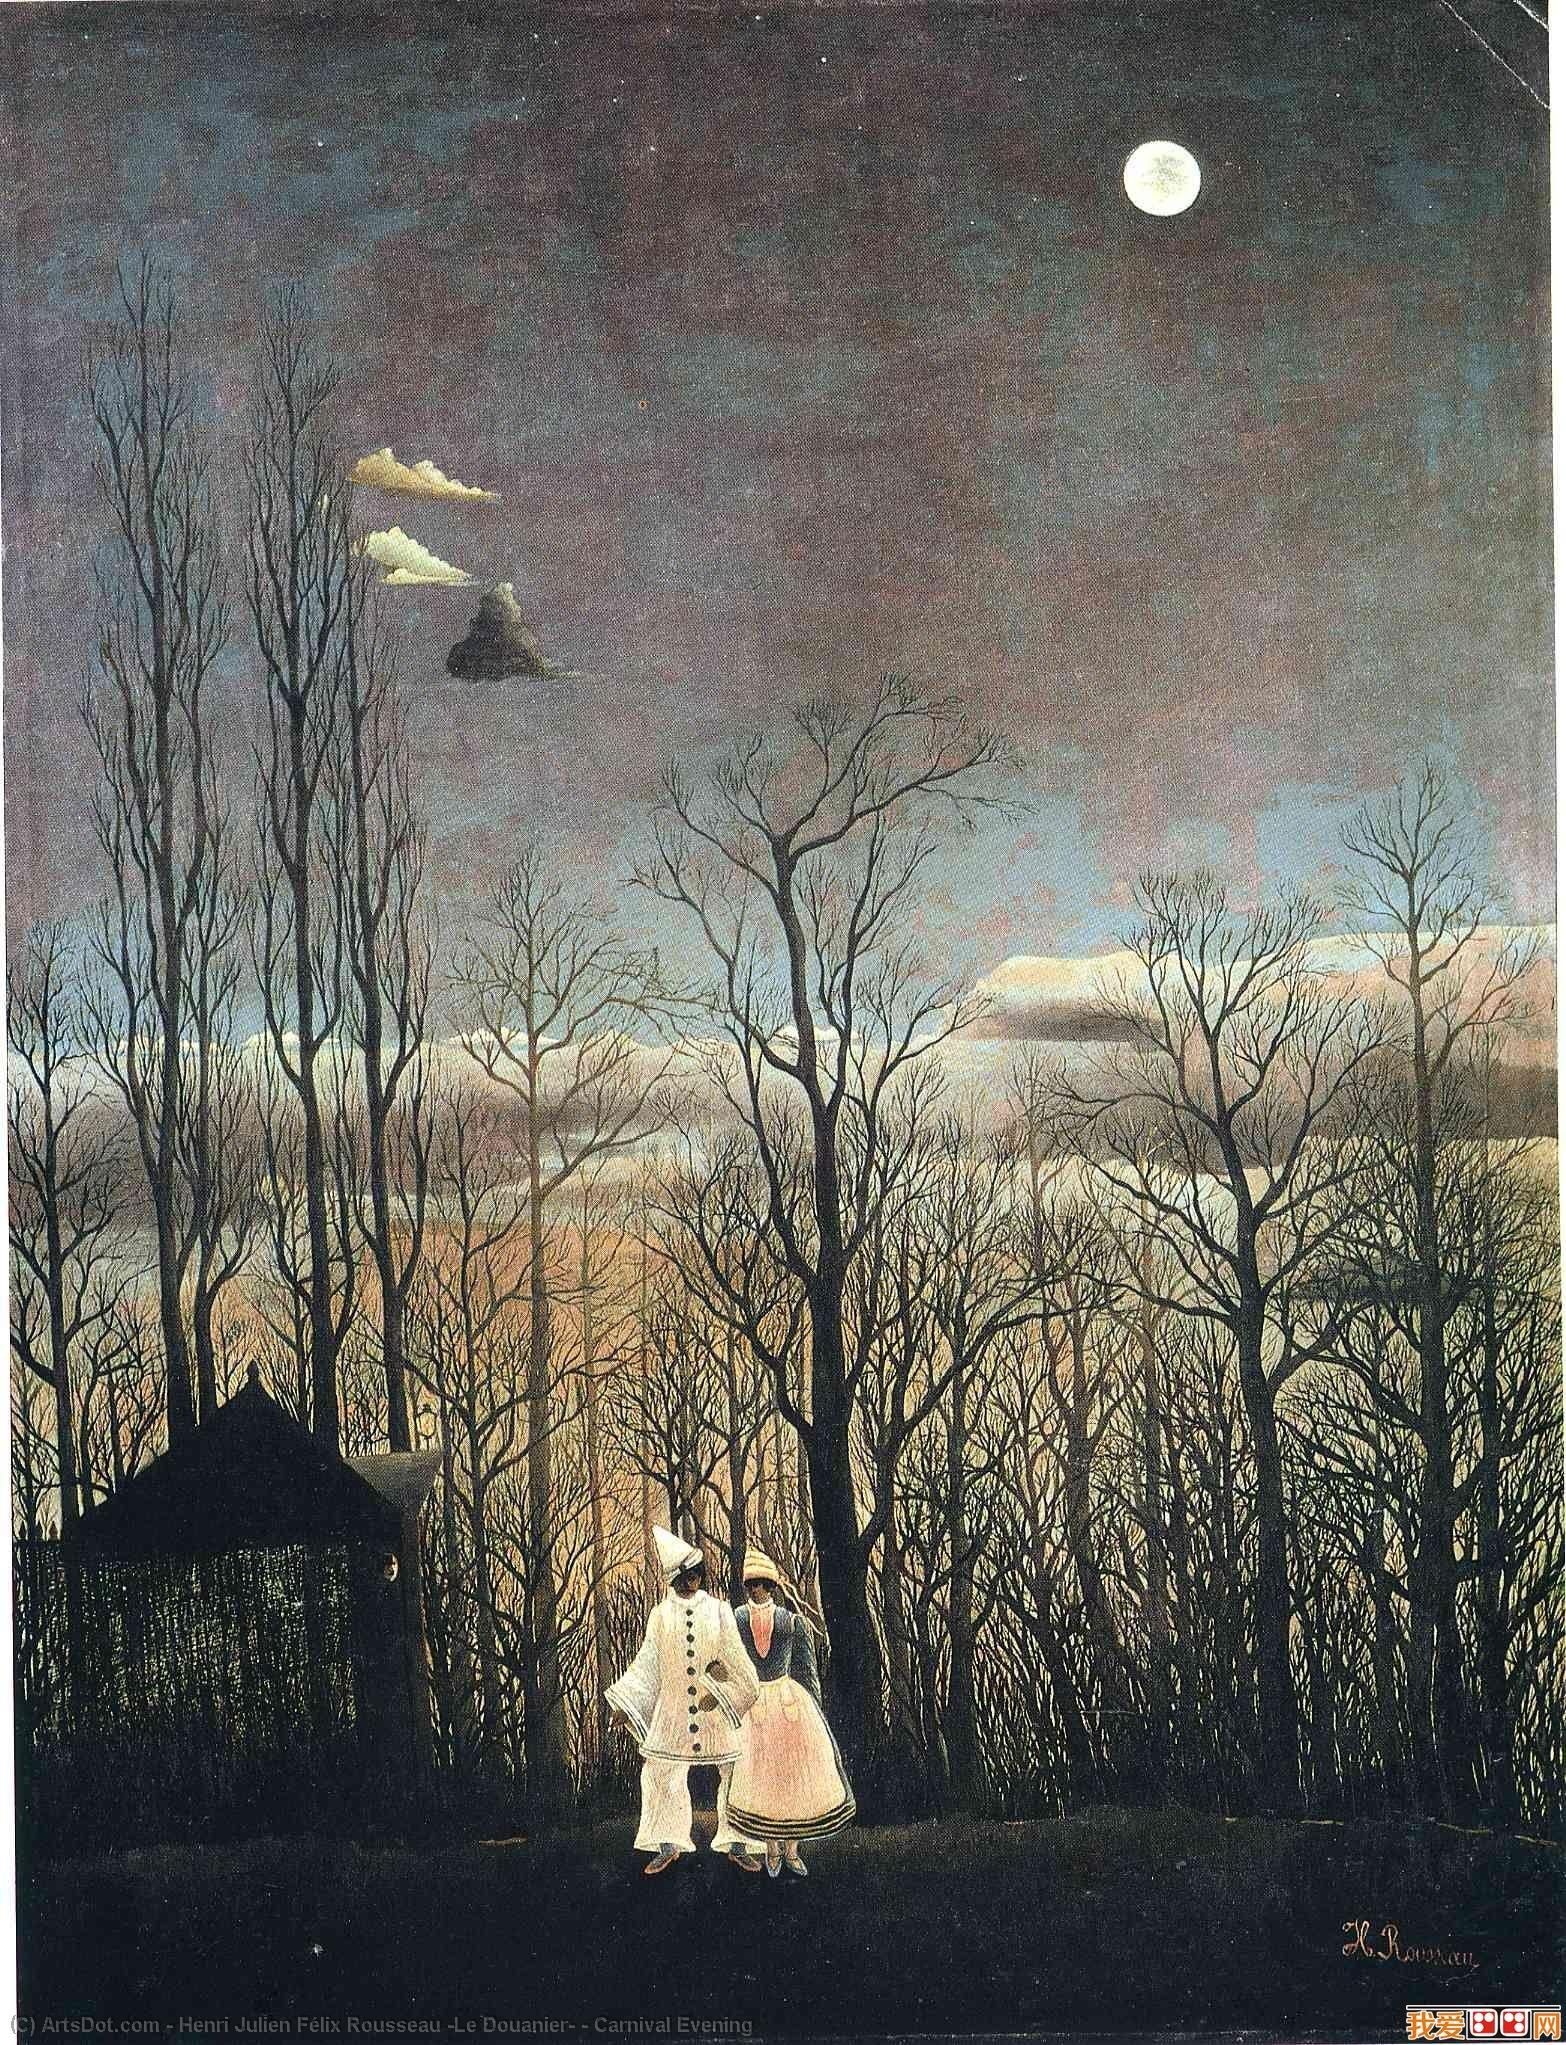 Wikioo.org - The Encyclopedia of Fine Arts - Painting, Artwork by Henri Julien Félix Rousseau (Le Douanier) - Carnival Evening